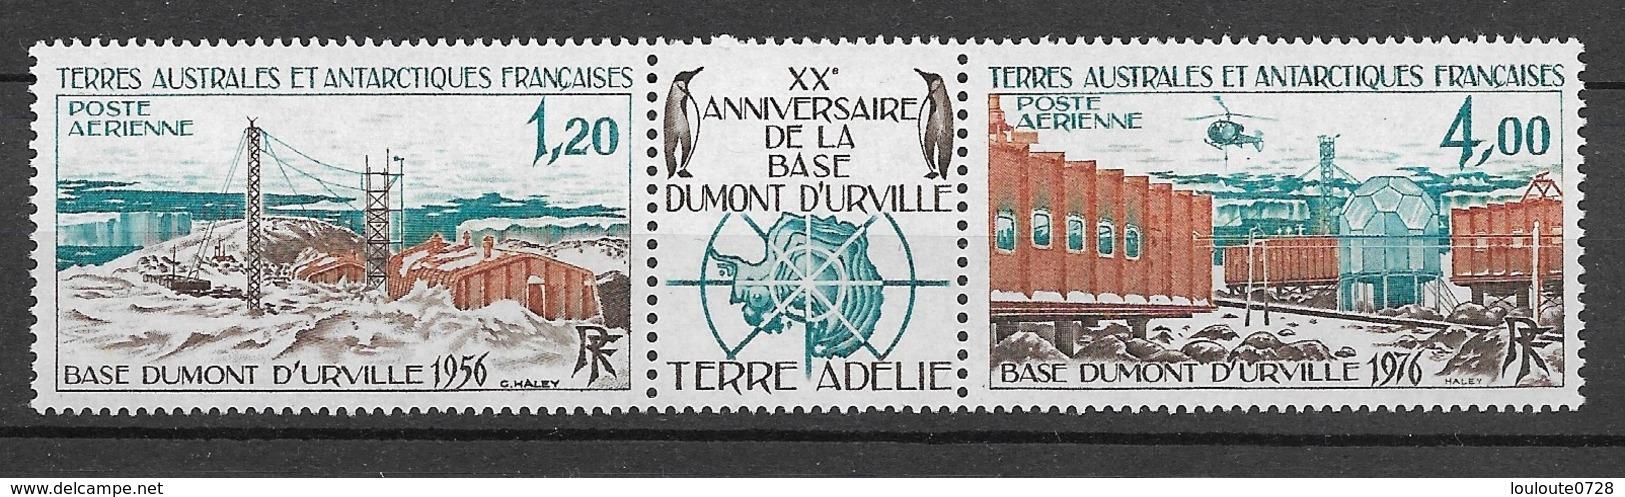 TAAF 1976 Poste Aérienne N° 43A  Triptyque  N * * Luxe  TTB - Colecciones & Series